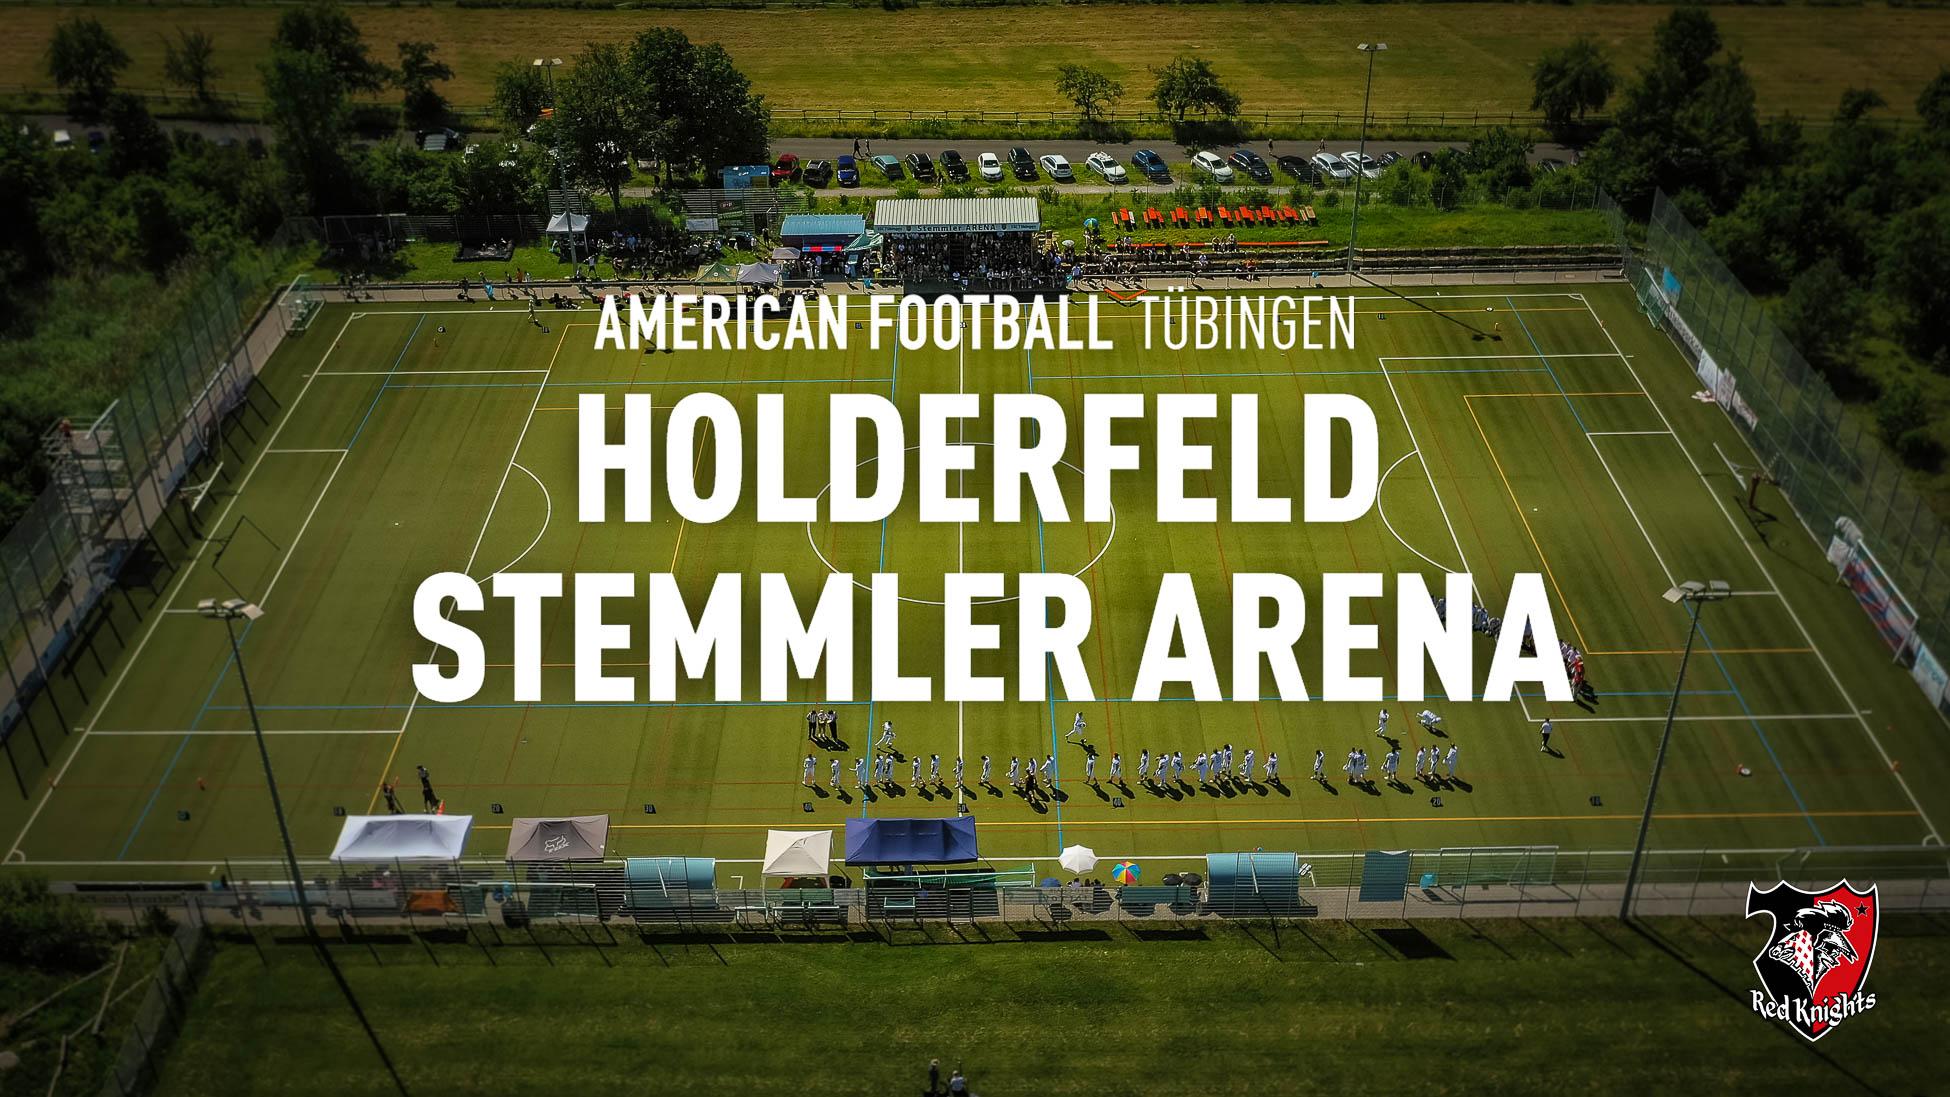 Home of the Red Knights - Holderfeld - Stemmler-Arena, SSC-Tübingen